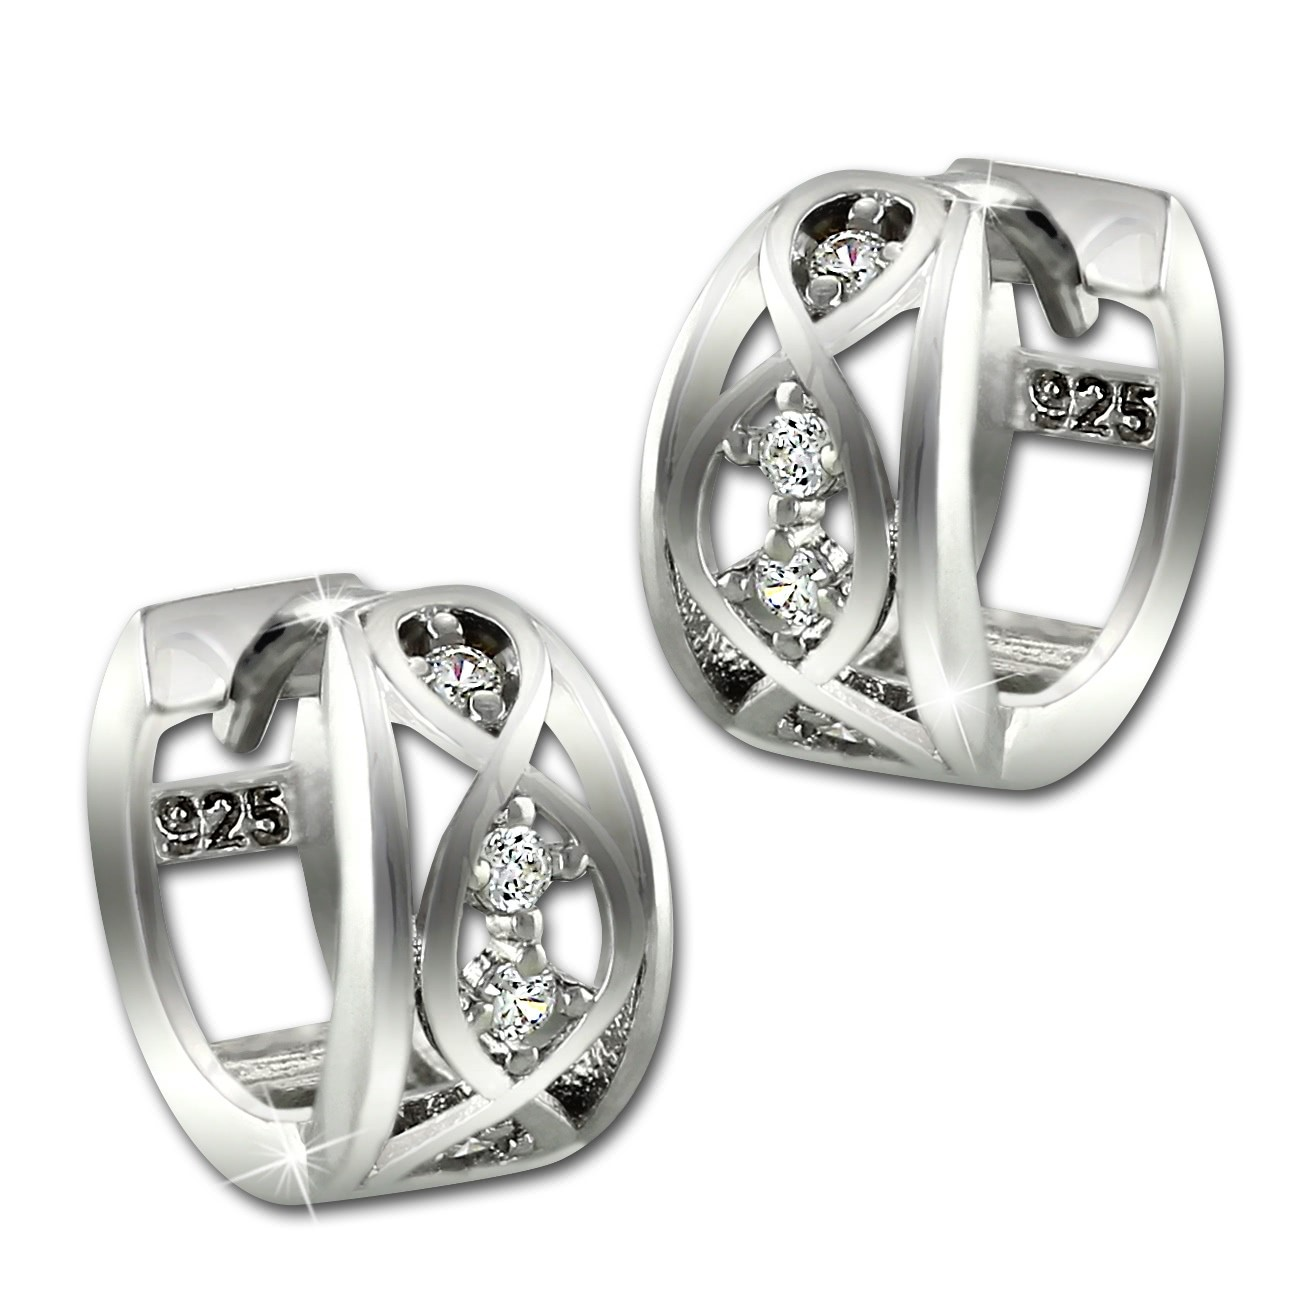 SilberDream Creole Ranke Zirkonia weiß 925 Sterling Silber Damen SDO4329W